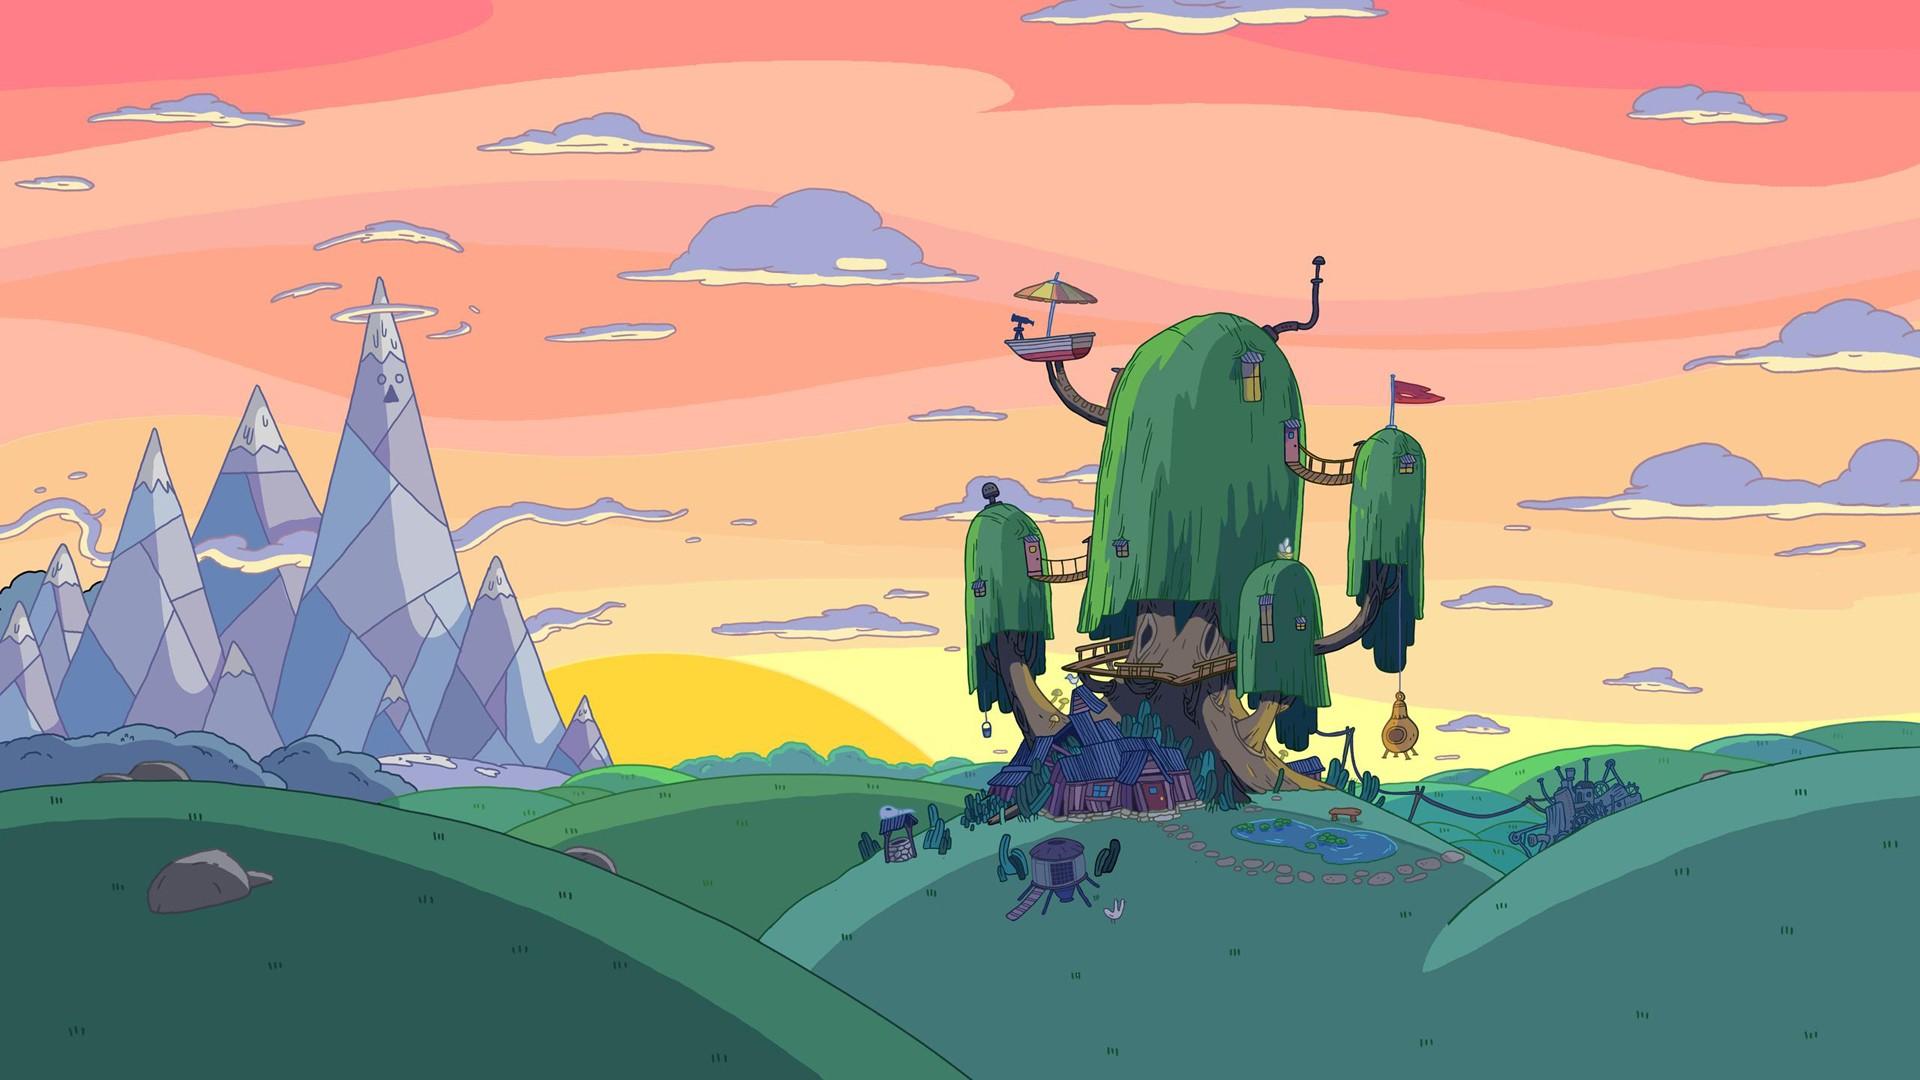 Adventure time background download free awesome full hd best adventure time background 1920x1080 lockscreen 1920x1080 best adventure time background 1920x1080 lockscreen voltagebd Gallery